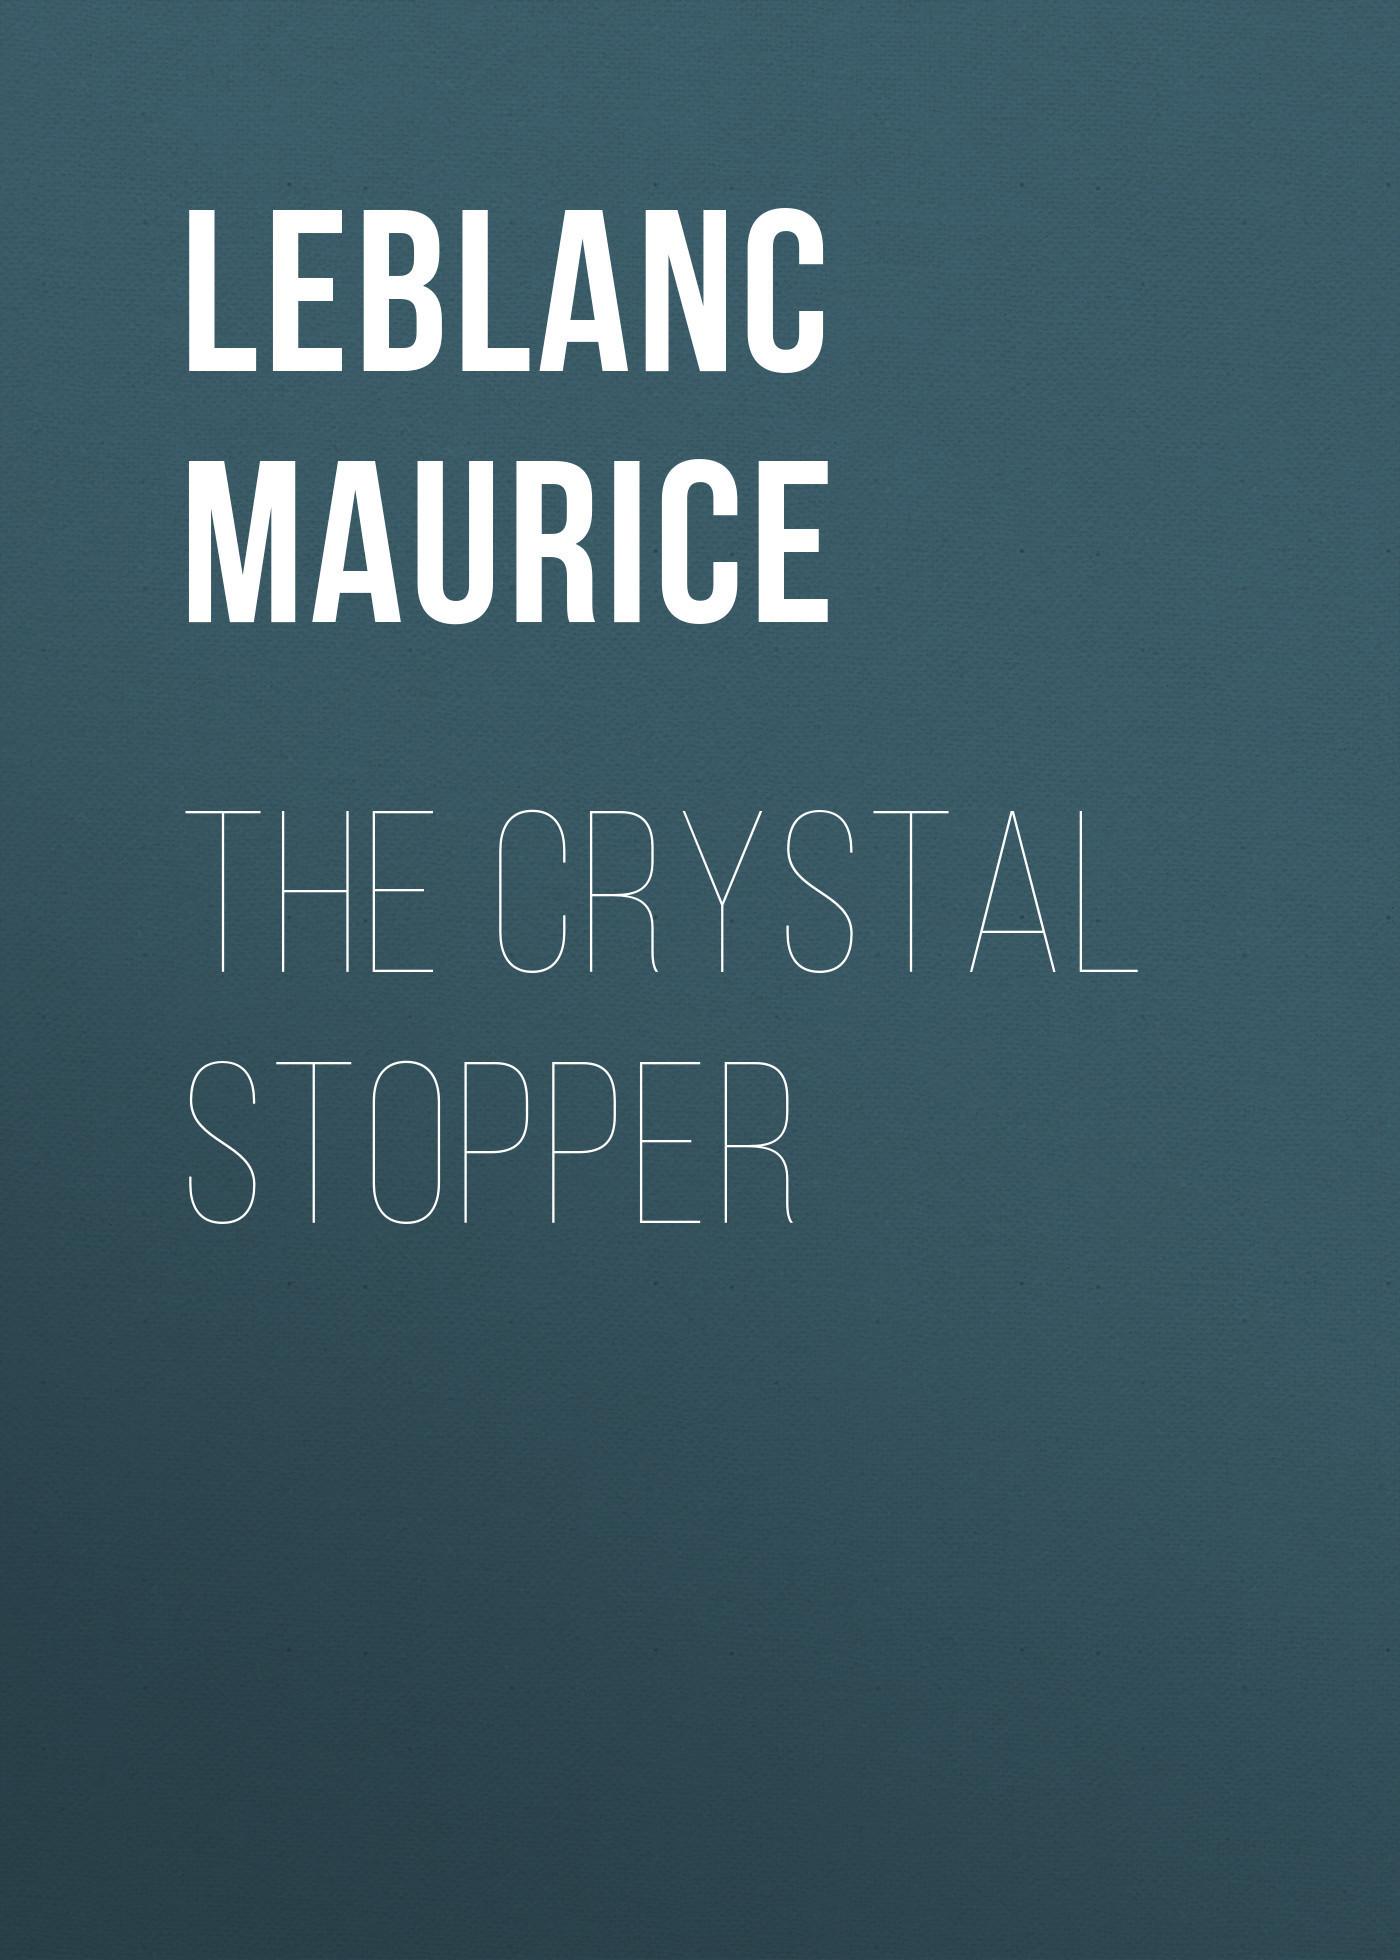 Leblanc Maurice The Crystal Stopper ifolaina customized image crystal wine bottle stopper personalized logo crystal ball bottle stopper